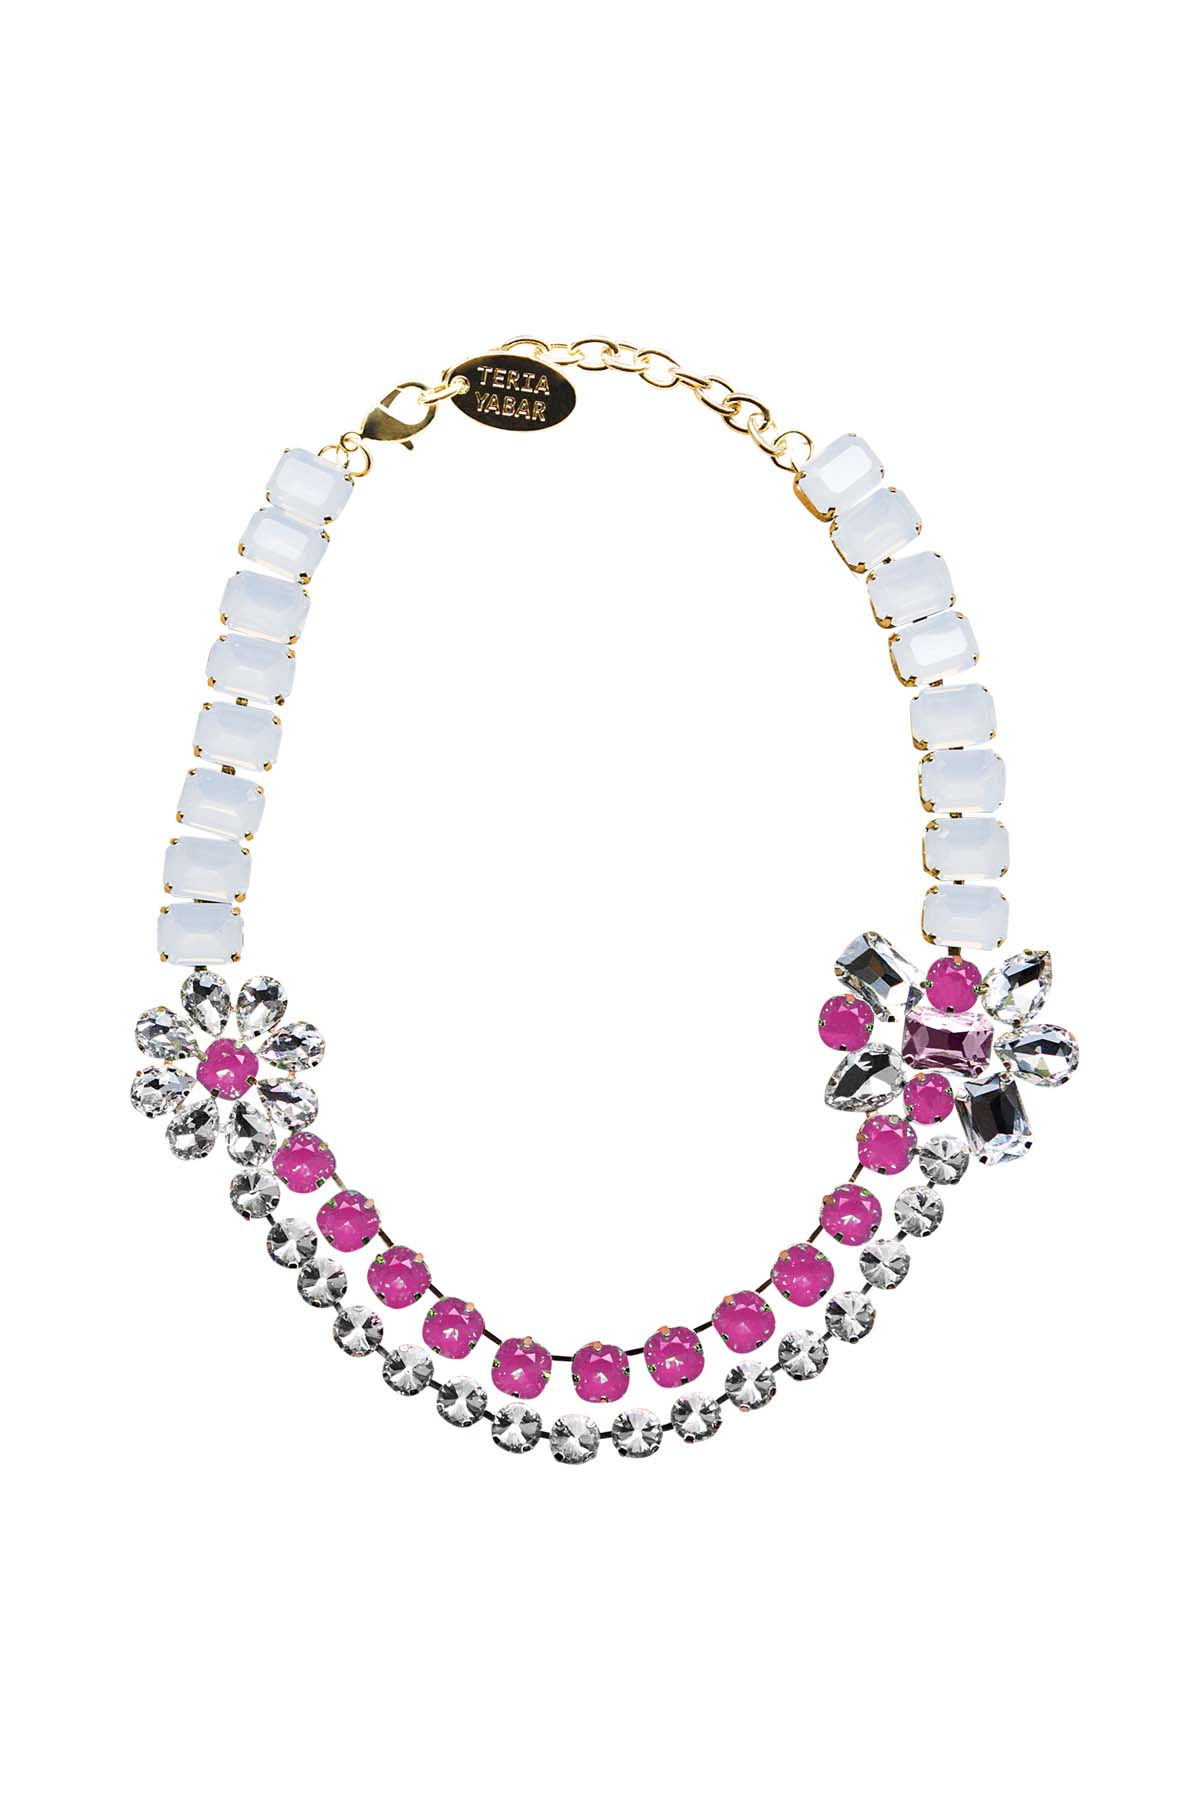 Teria Yabar - Collar joya de cristal y resina rosa